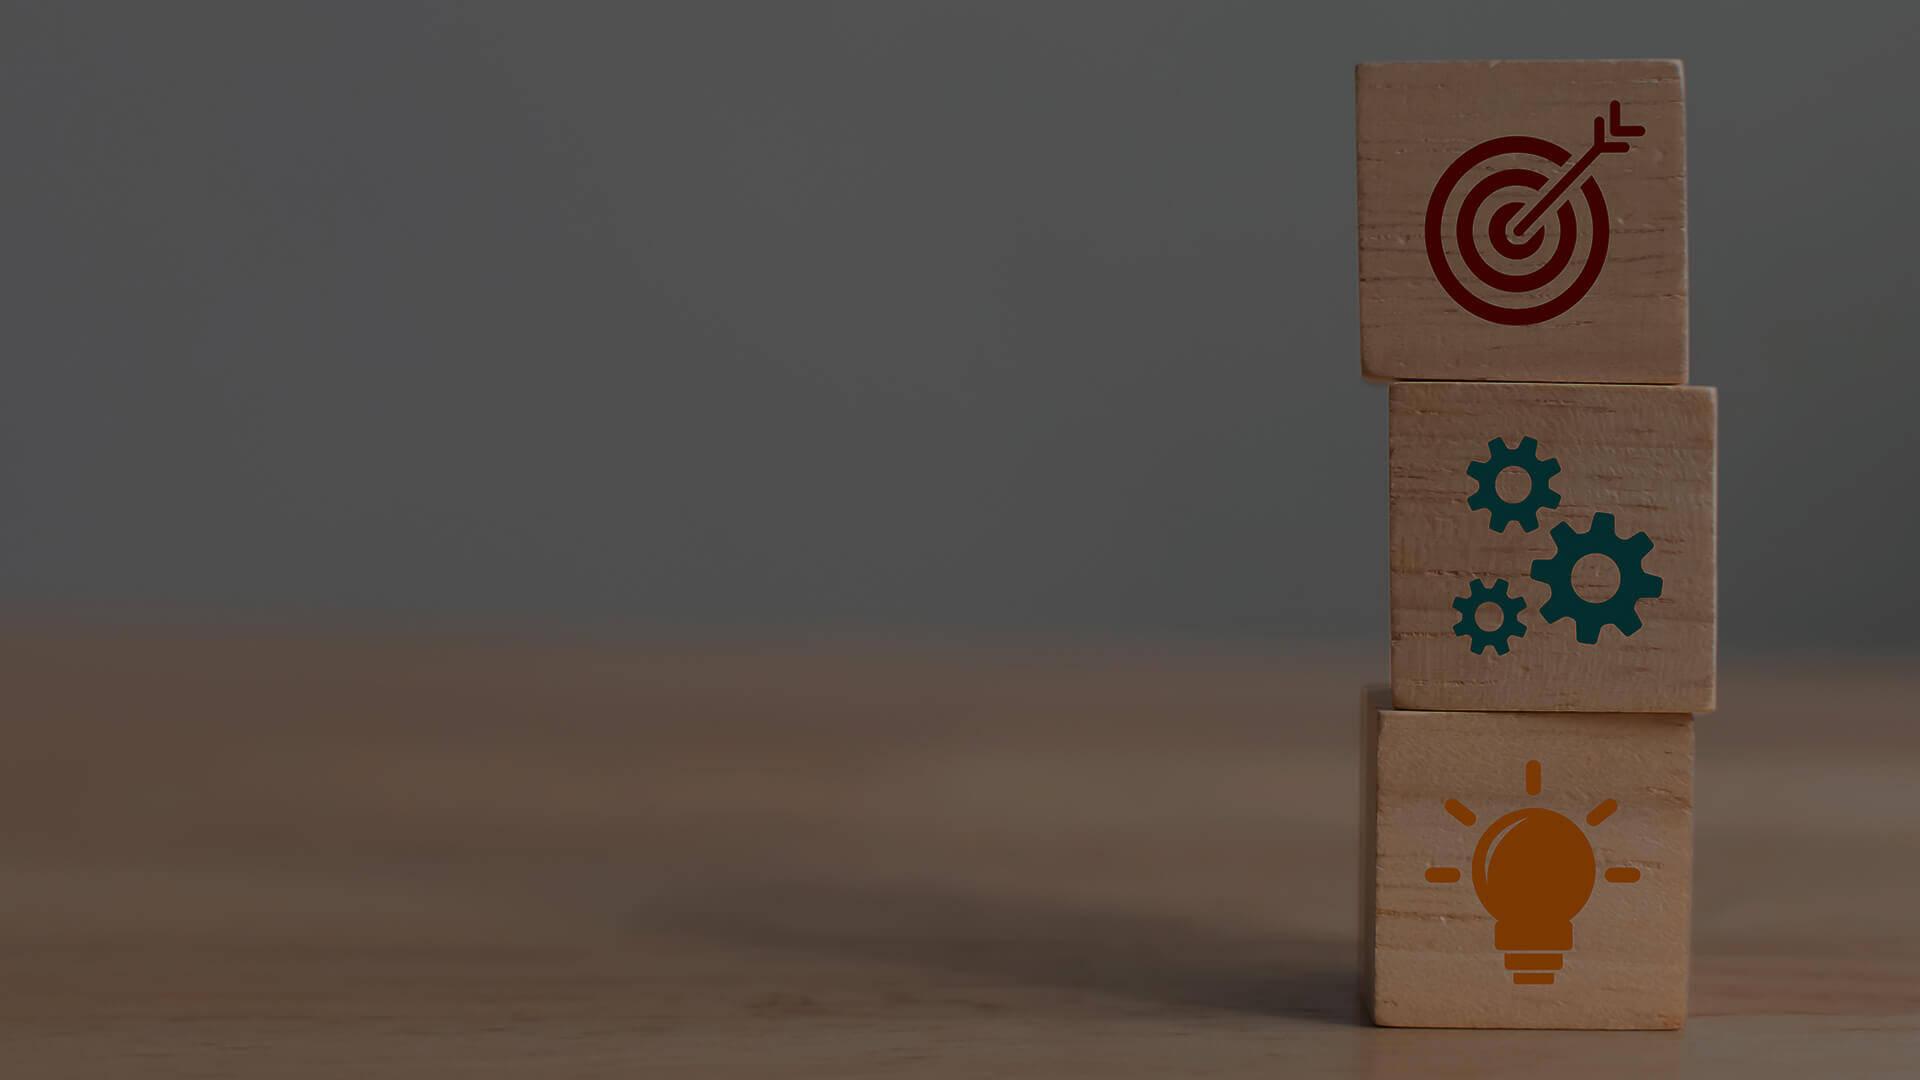 branding strategy tools